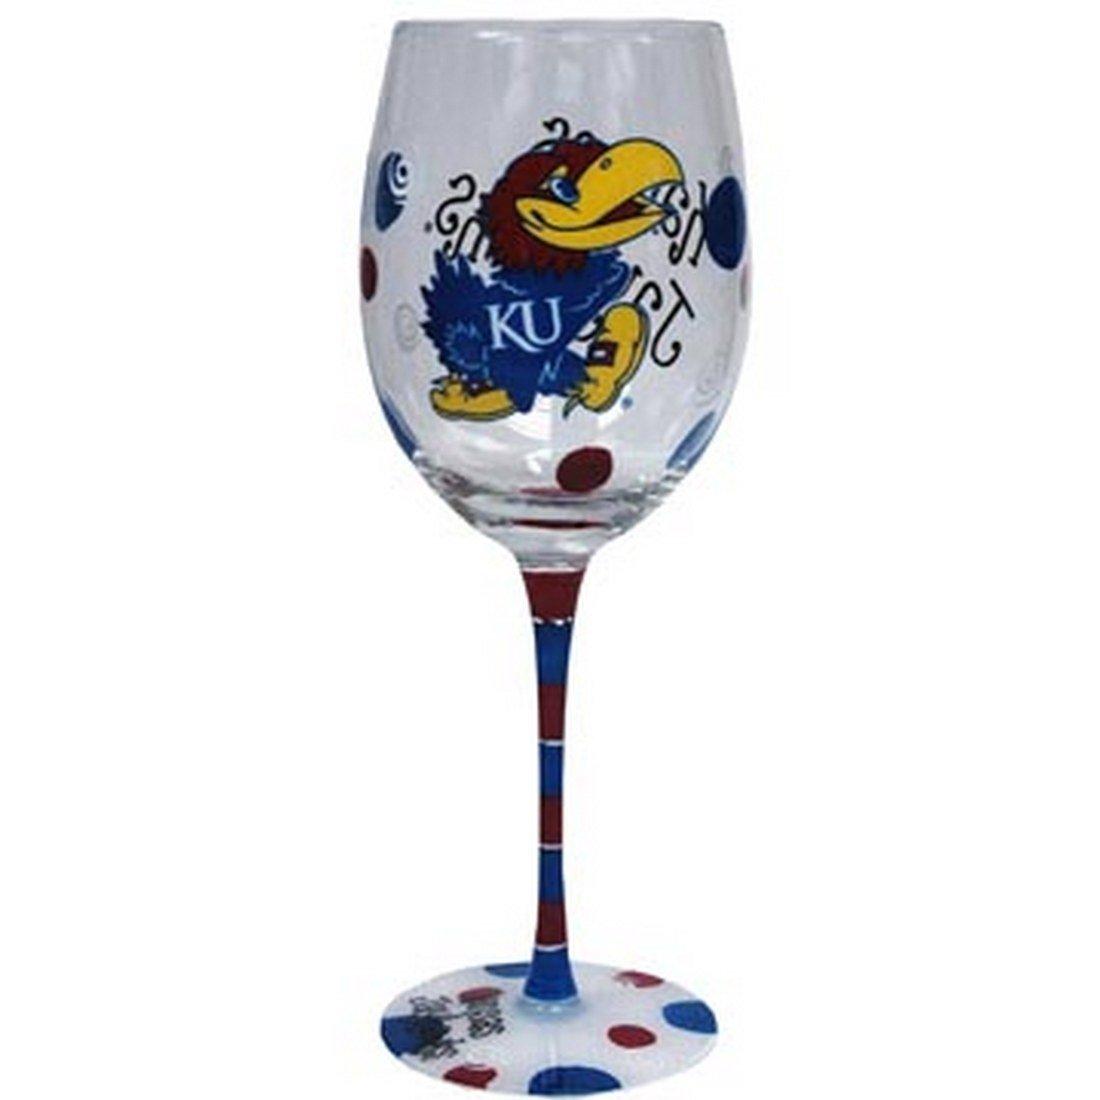 Kansas Jayhawks Blue and Red Hand Painted Wine Glass Jenkins Enterprises/' COMINHKPR119258